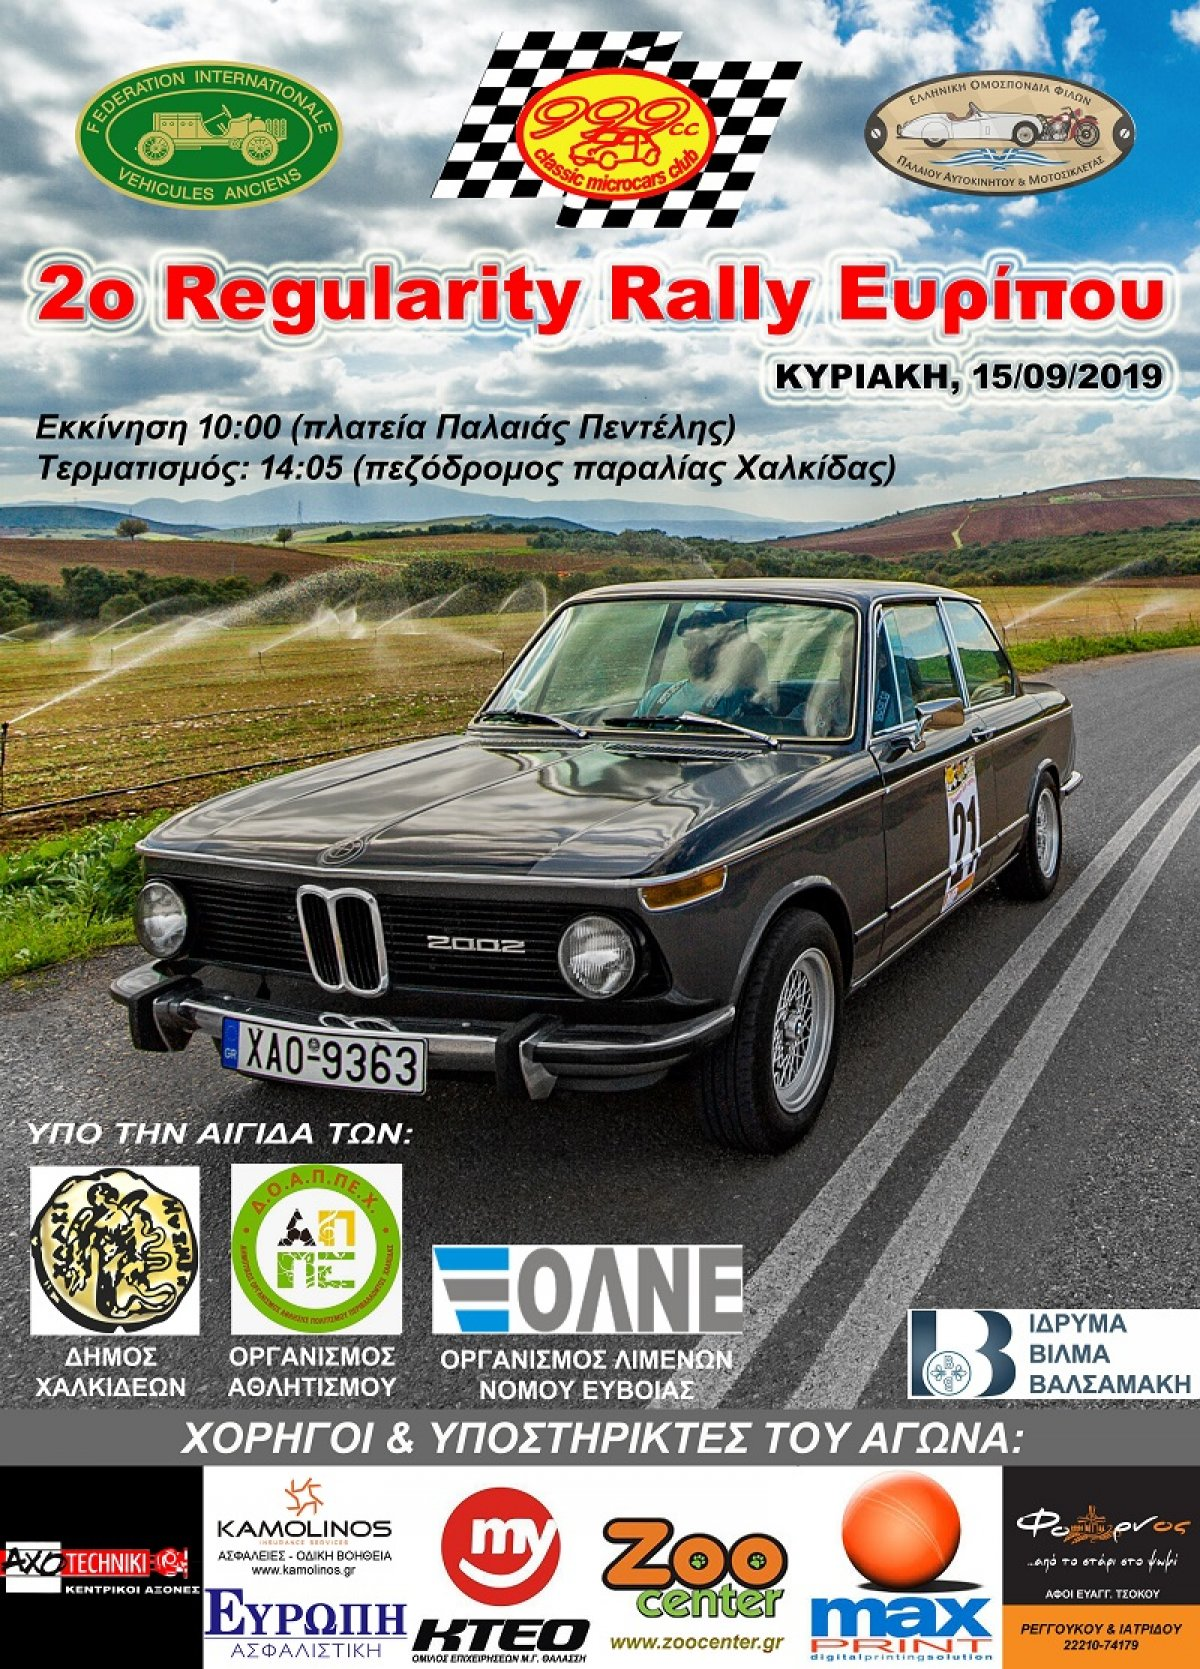 Regularity Rally Ευρίπου | 15 Σεπτεμβρίου 2019